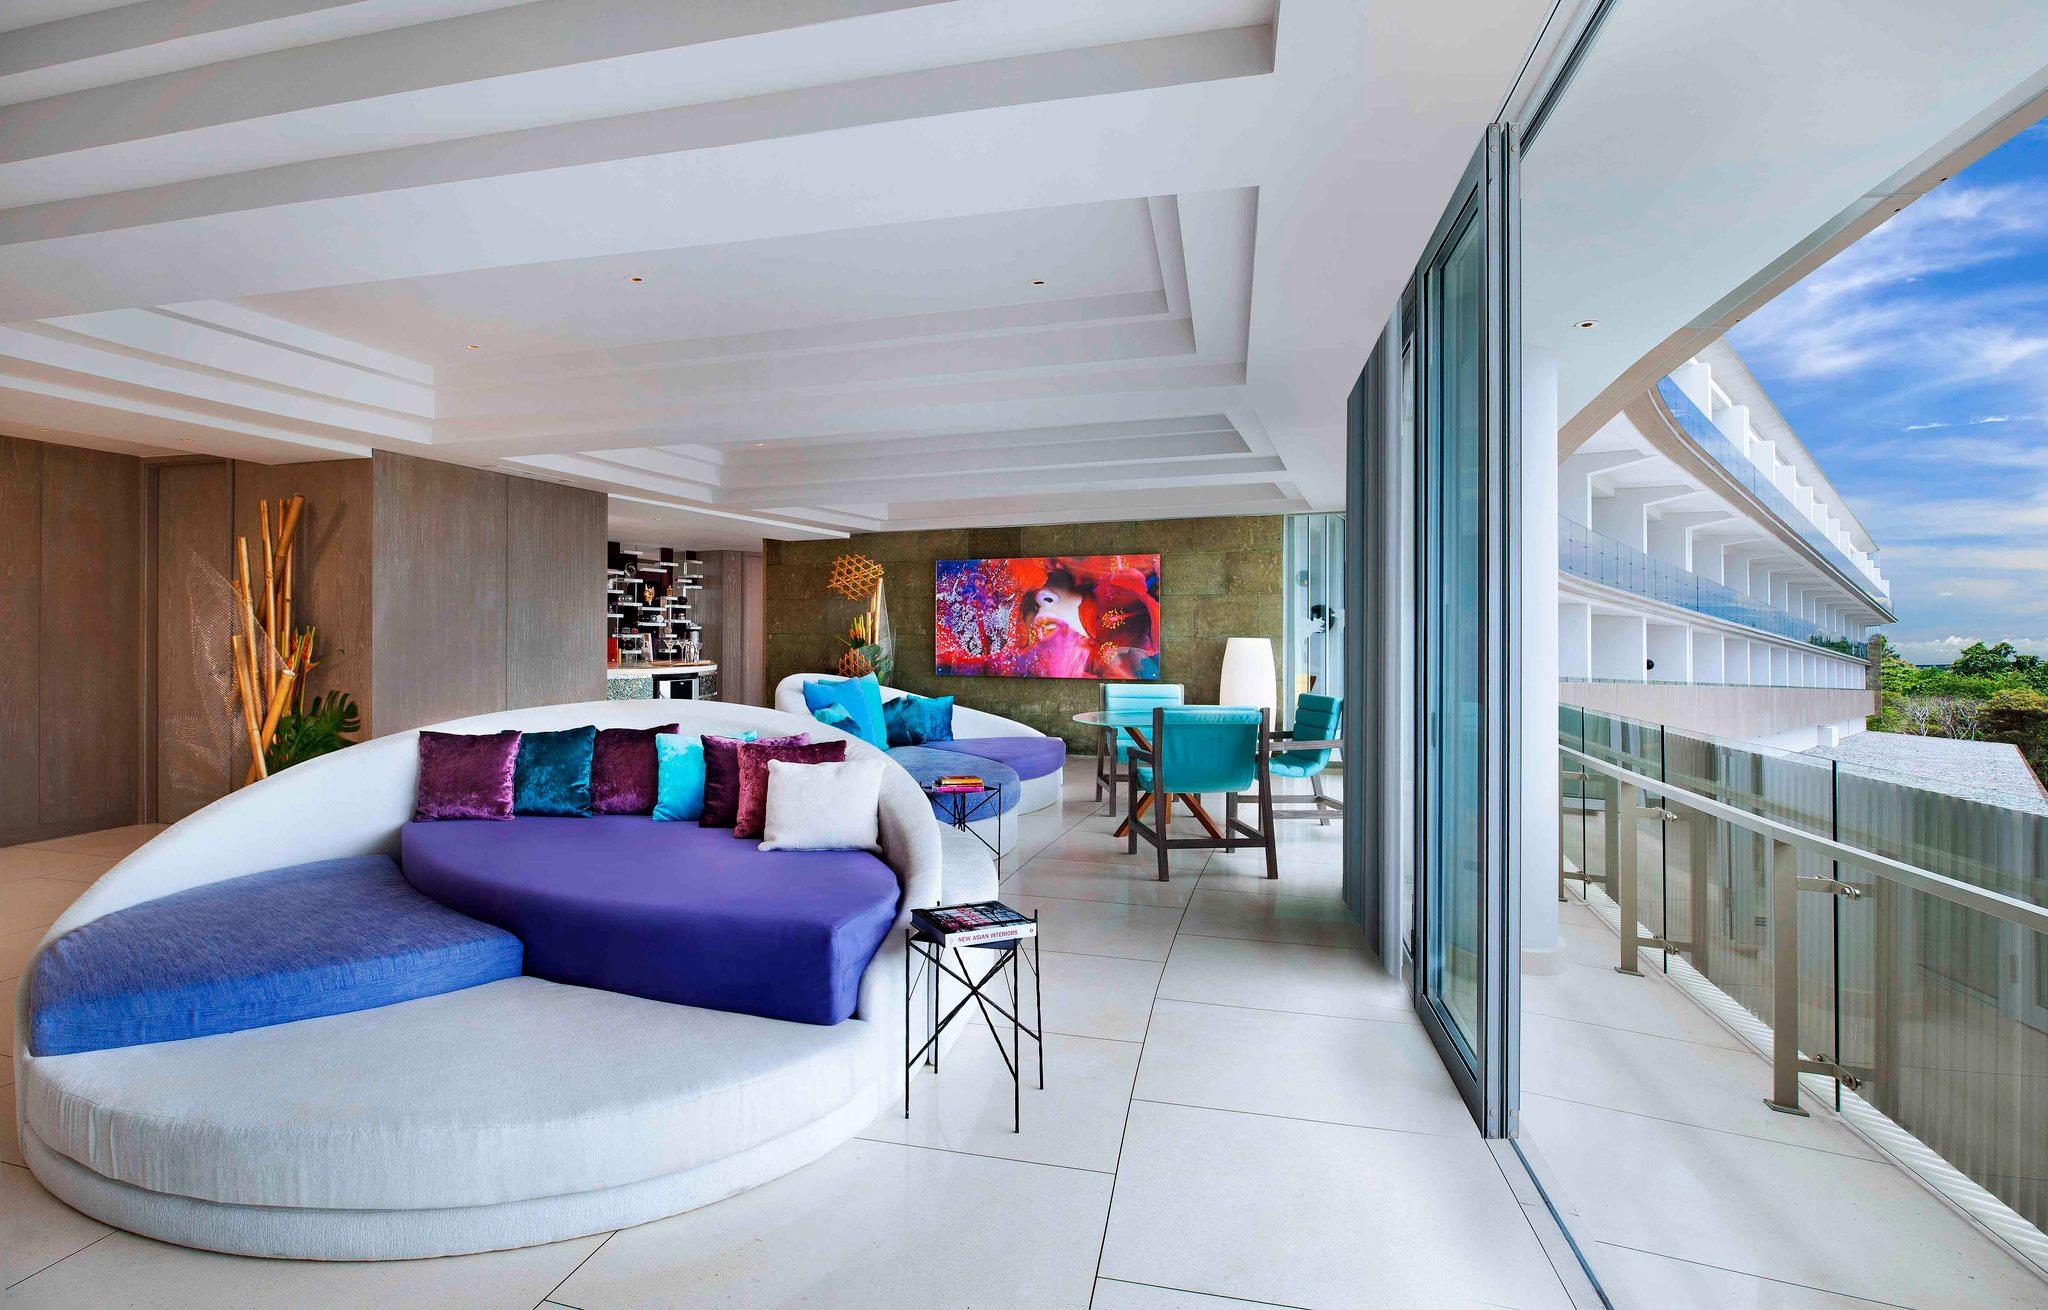 Hotel W Retreat & Spa Bali 5*